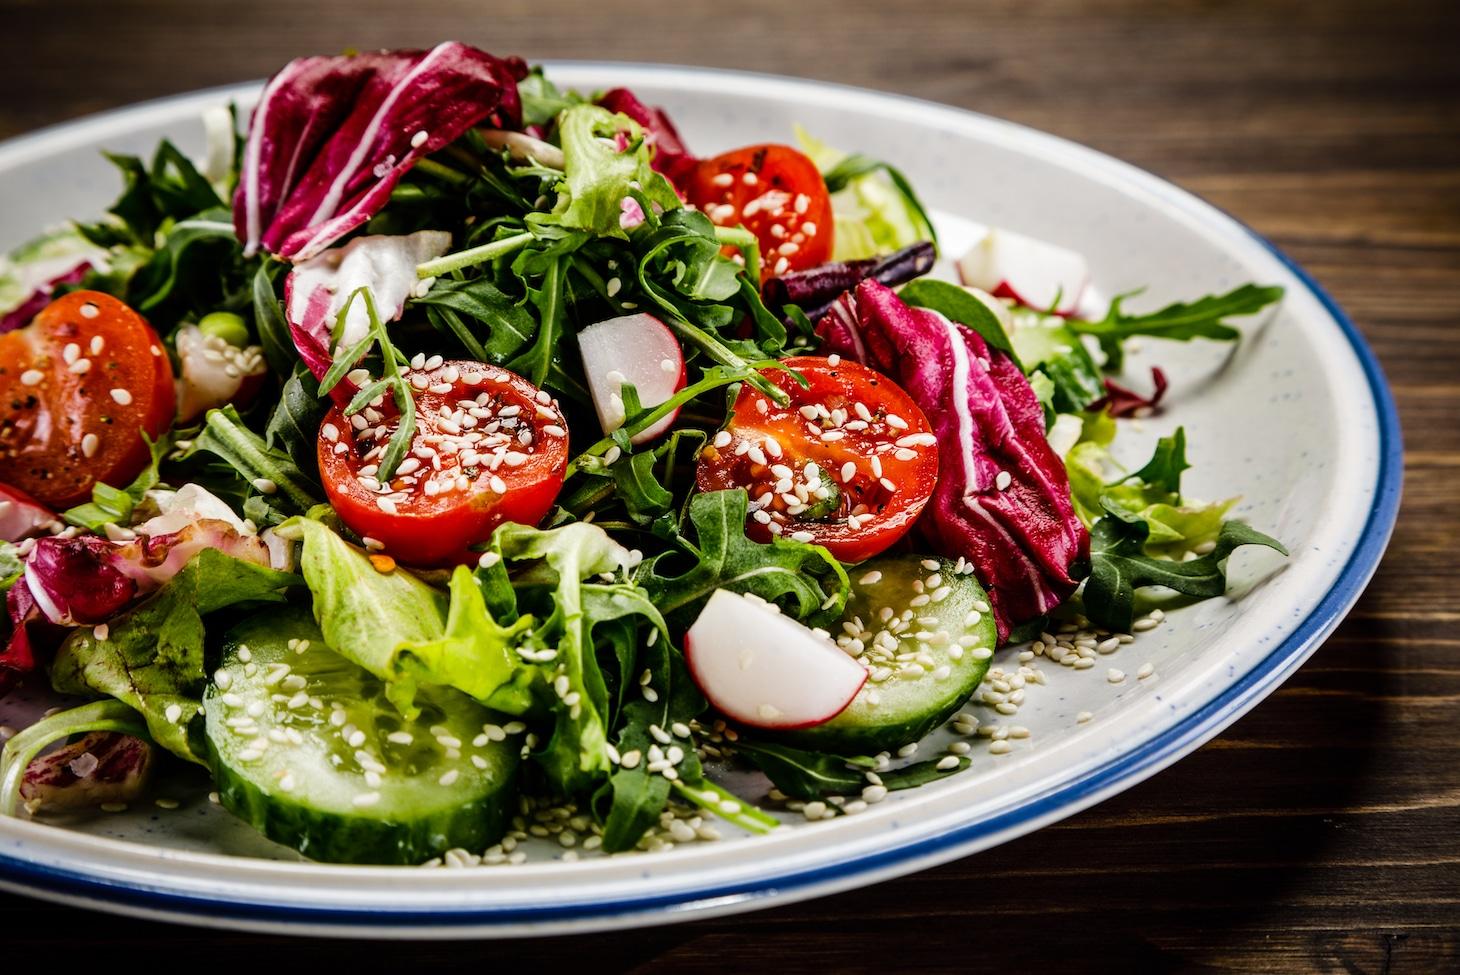 Салат с редисом и перцем.jpg